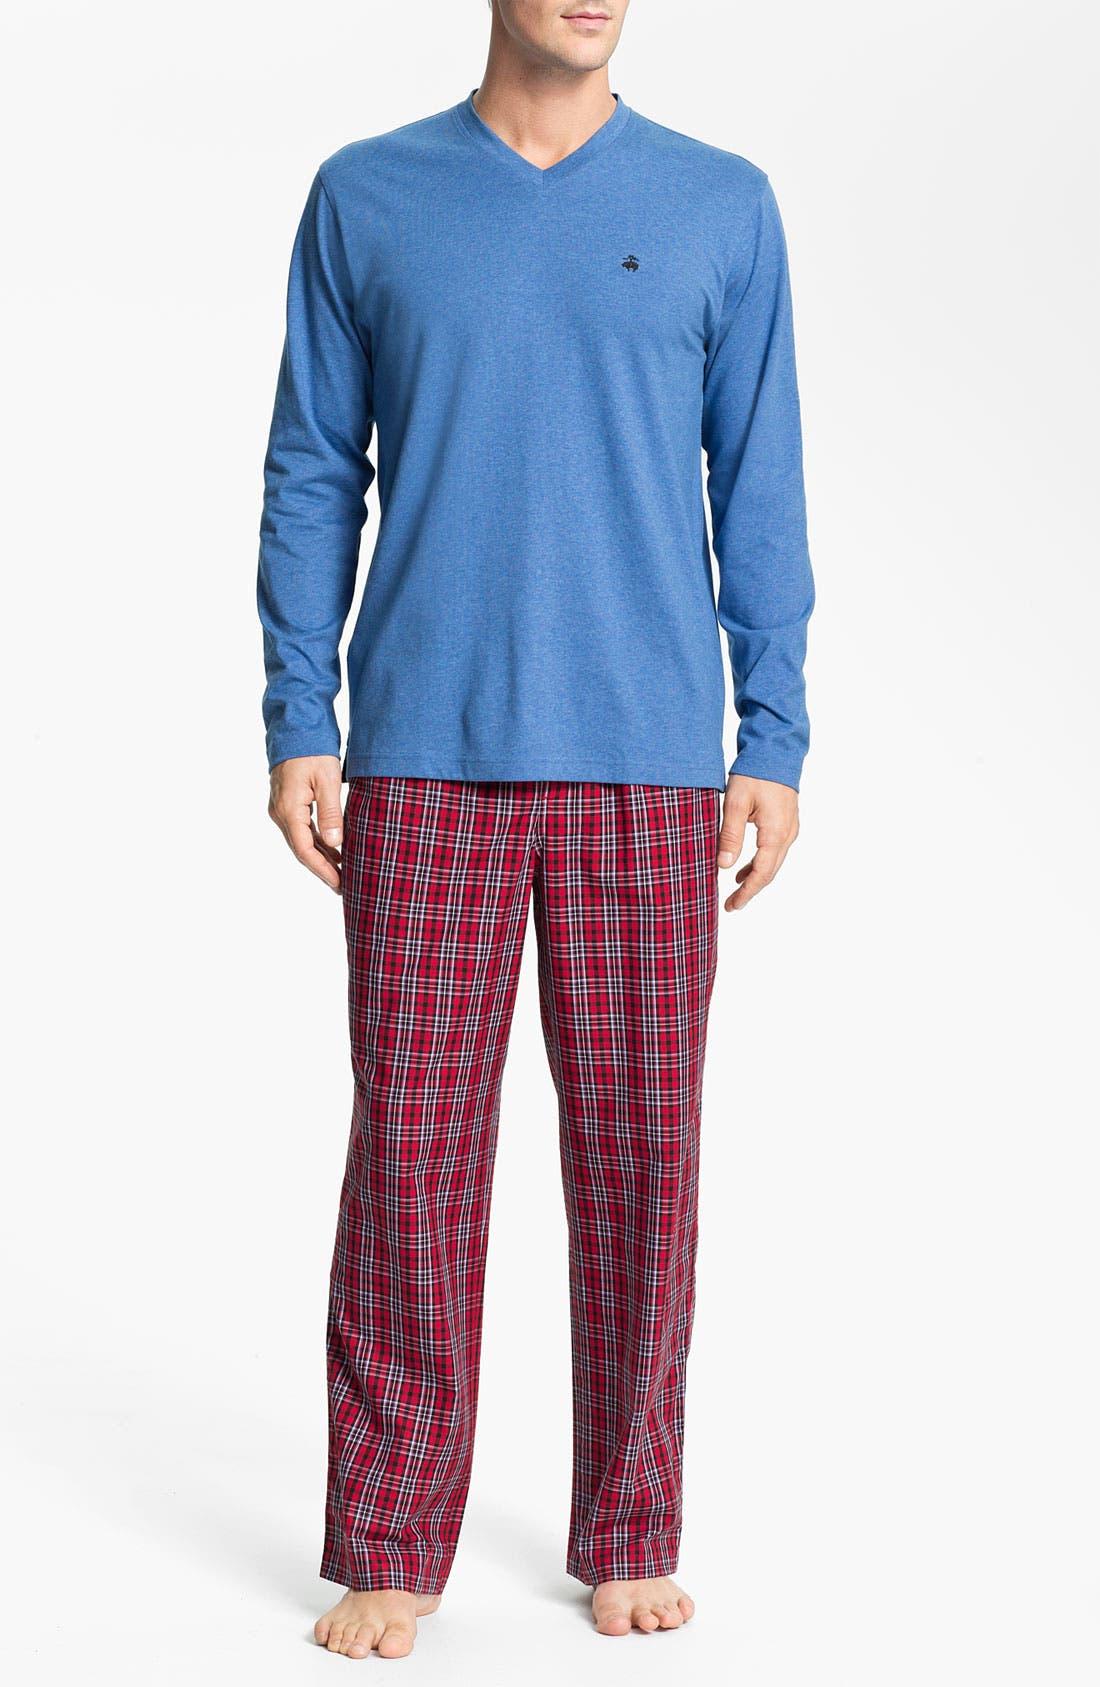 Alternate Image 1 Selected - Brooks Brothers Cotton Pajama Set